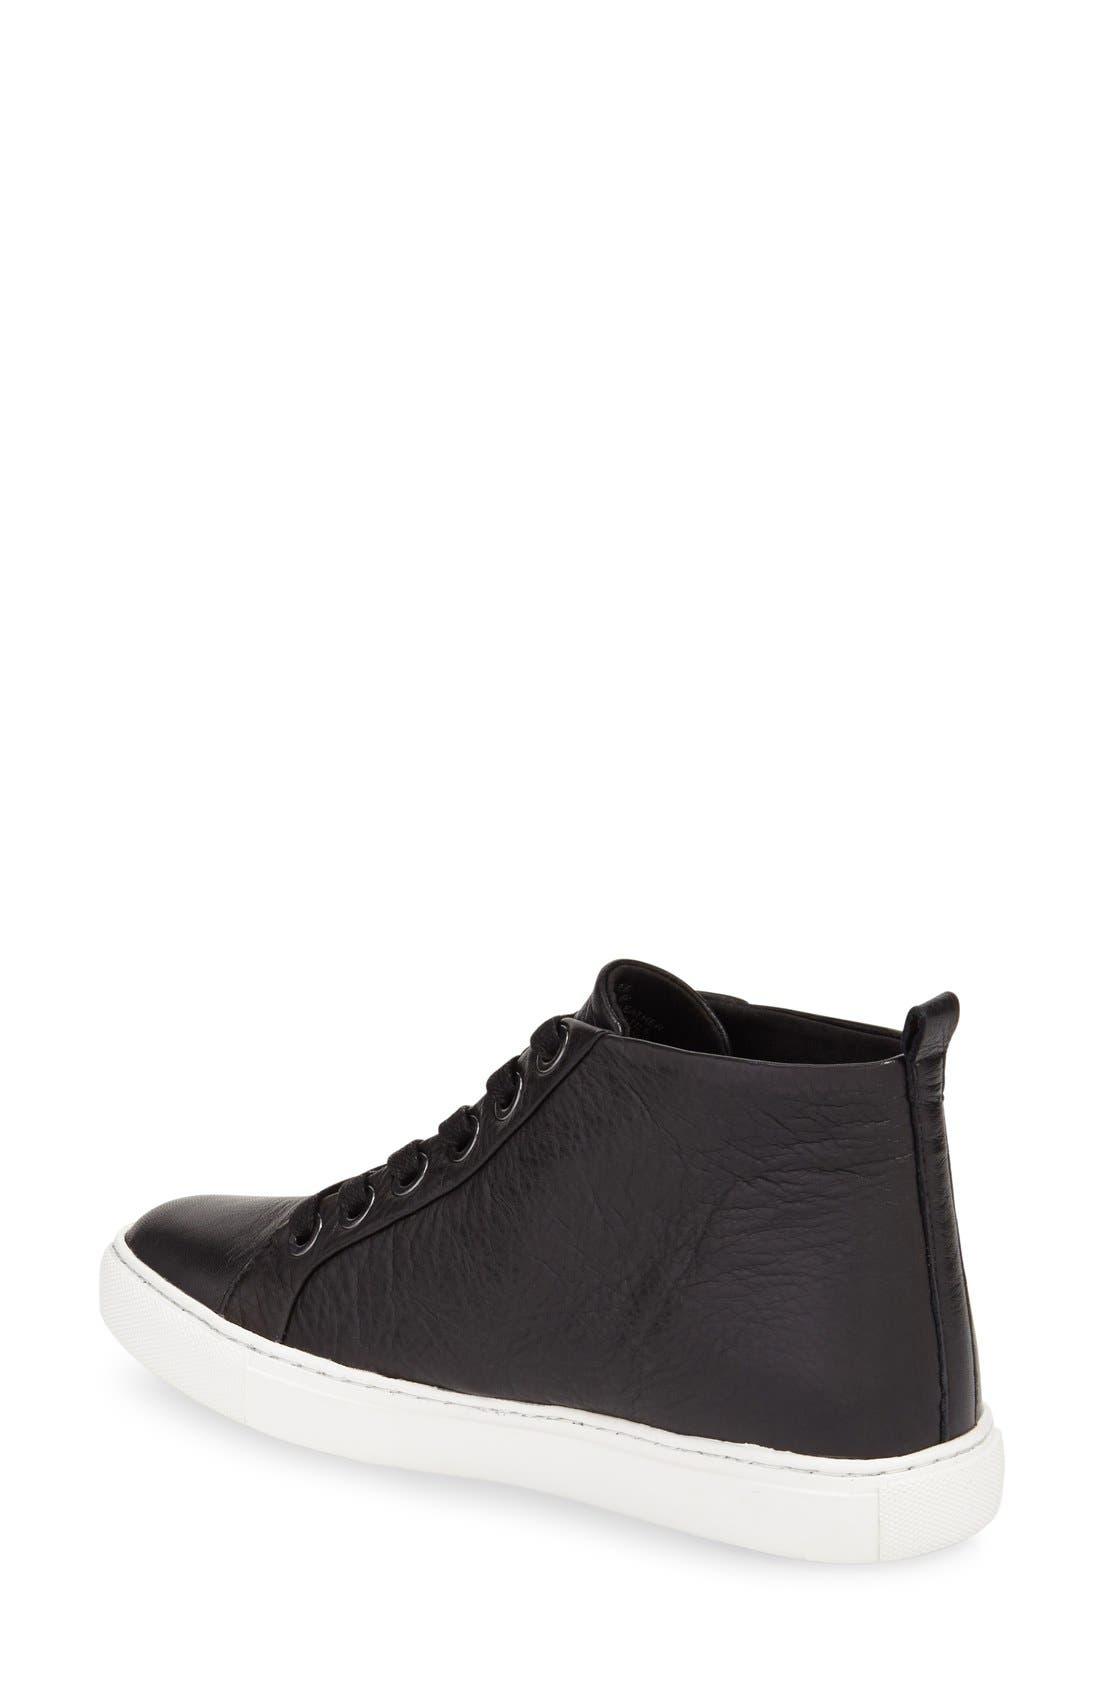 'Kaleb' High Top Sneaker,                             Alternate thumbnail 5, color,